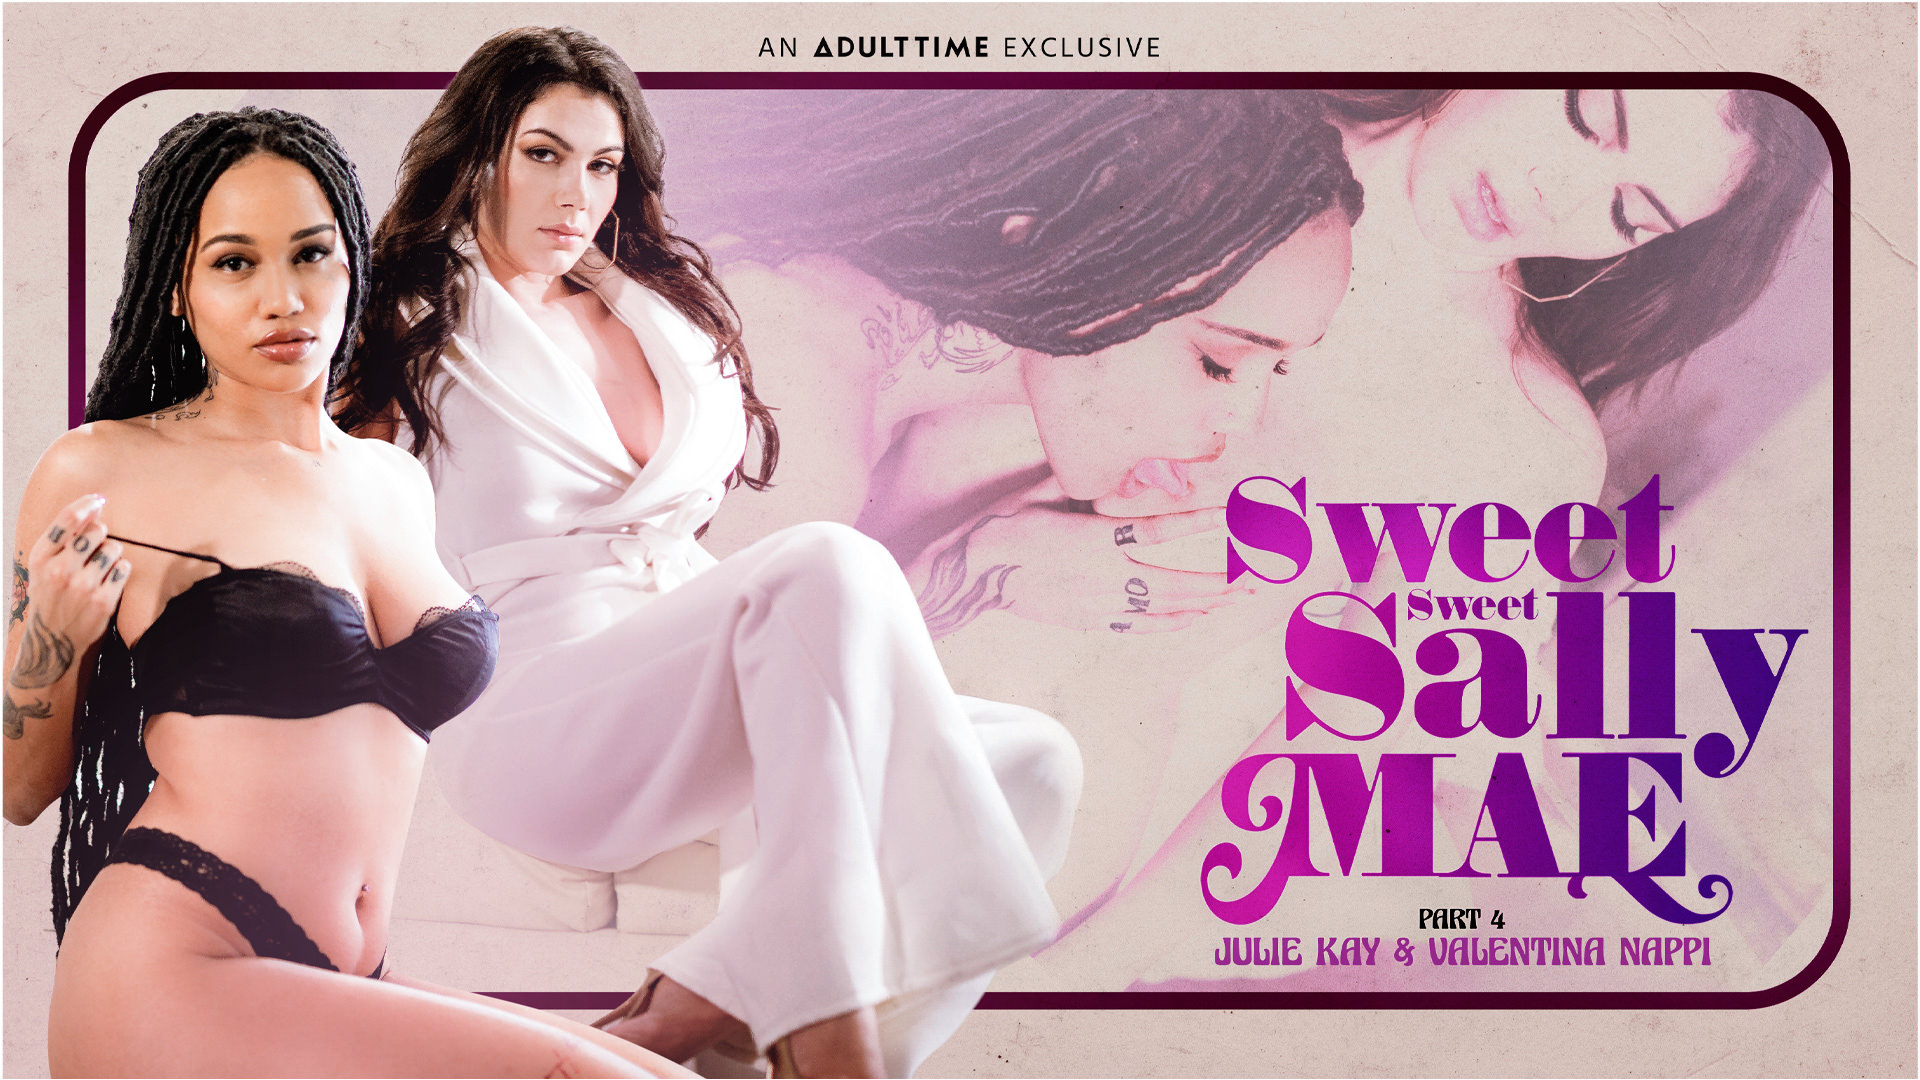 Sweet Sweet Sally Mae - Part 4 - Julie Kay & Valentina Nappi 1